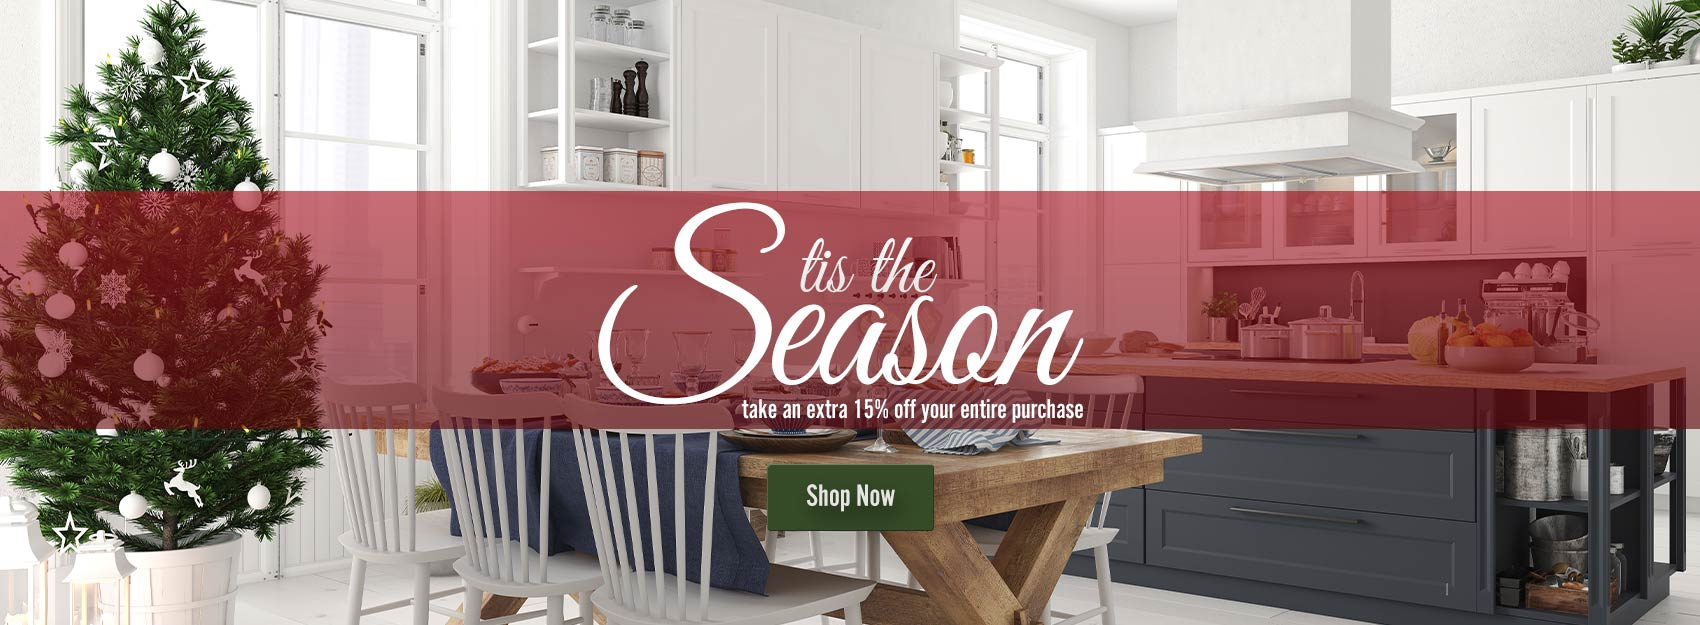 Tis the Season Home Sale